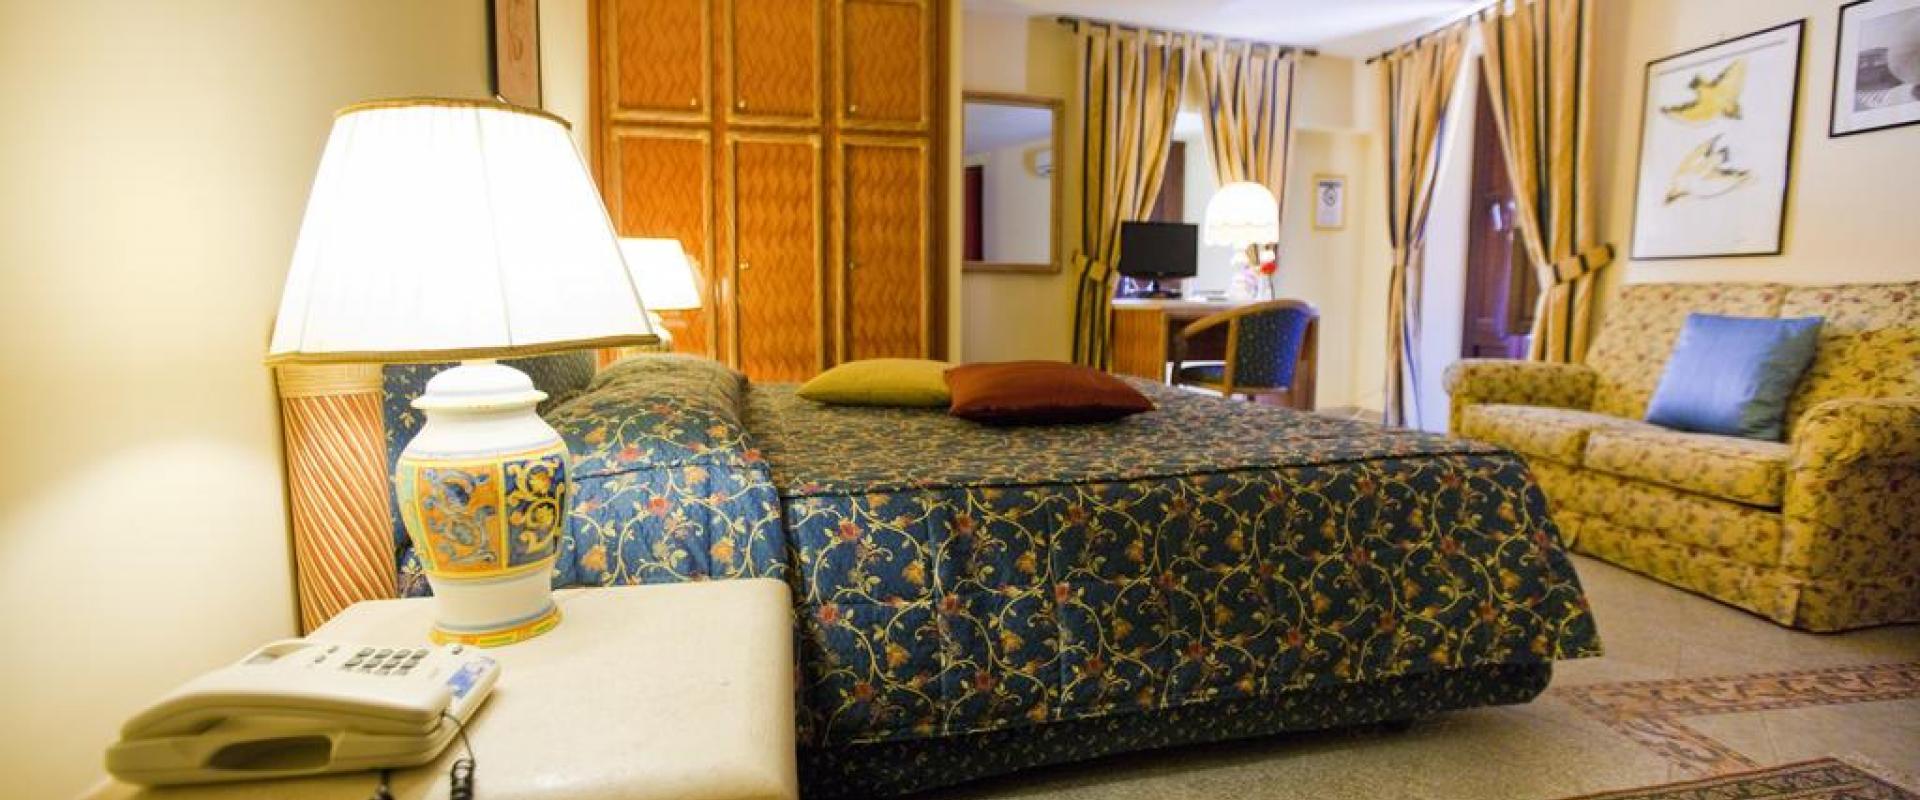 Hotel Elimo